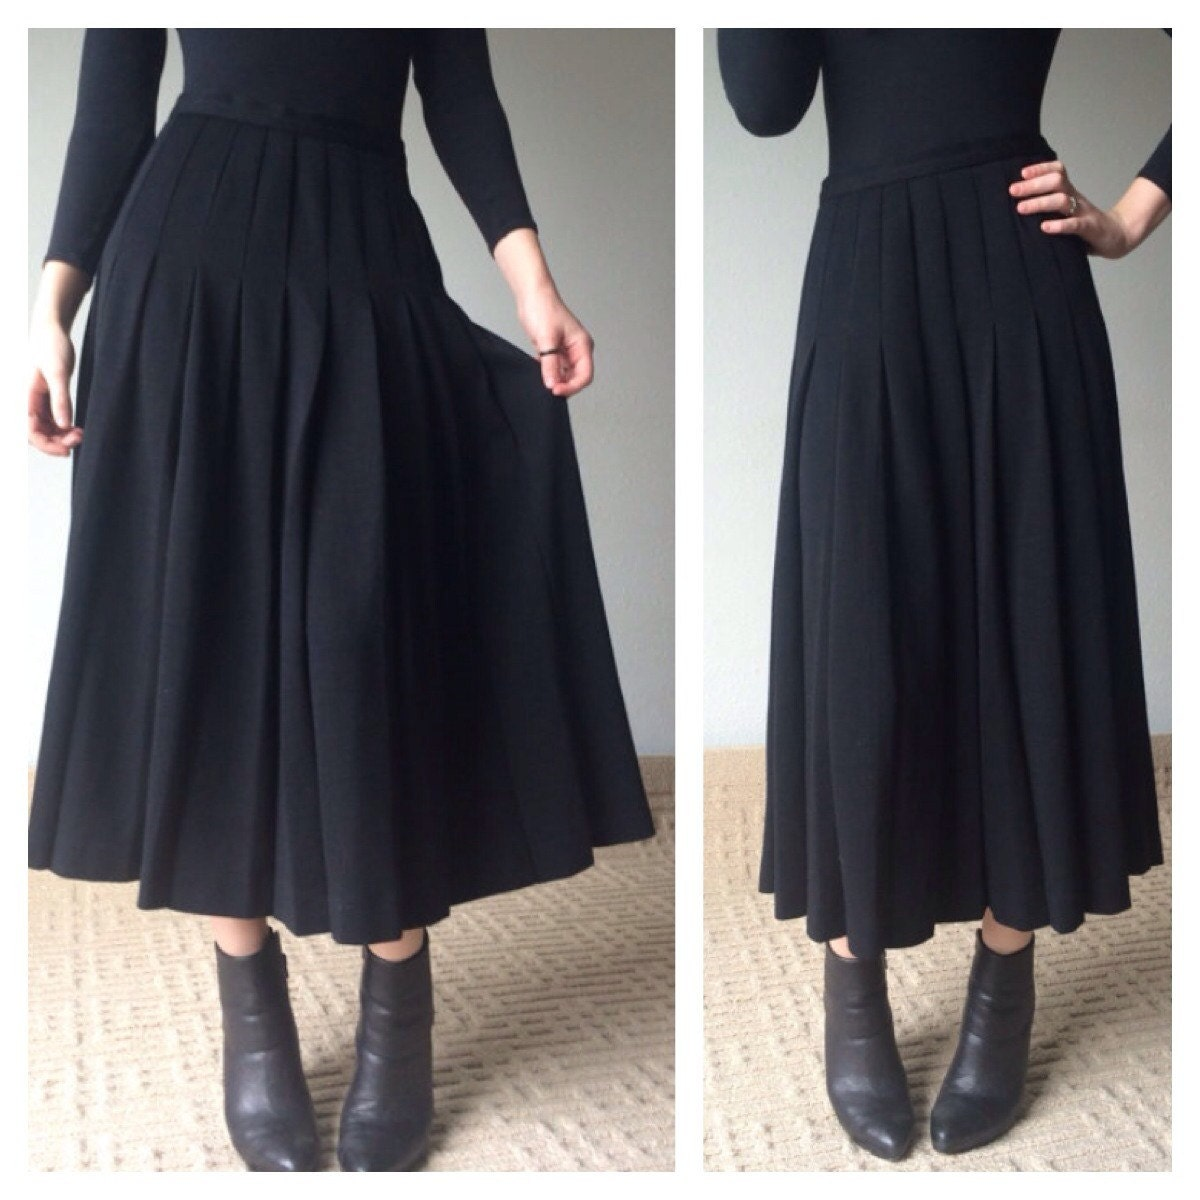 Black Ankle Length Skirt   Dress images